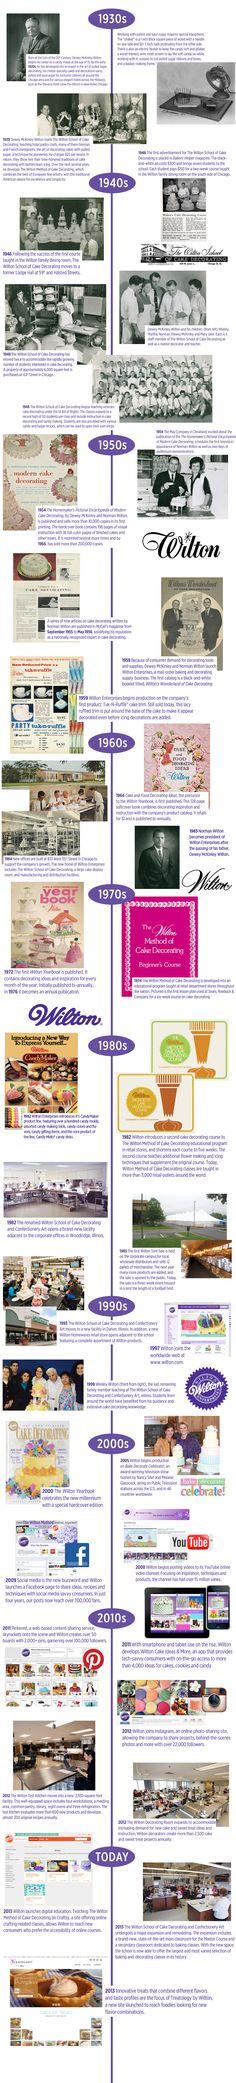 History of Wilton